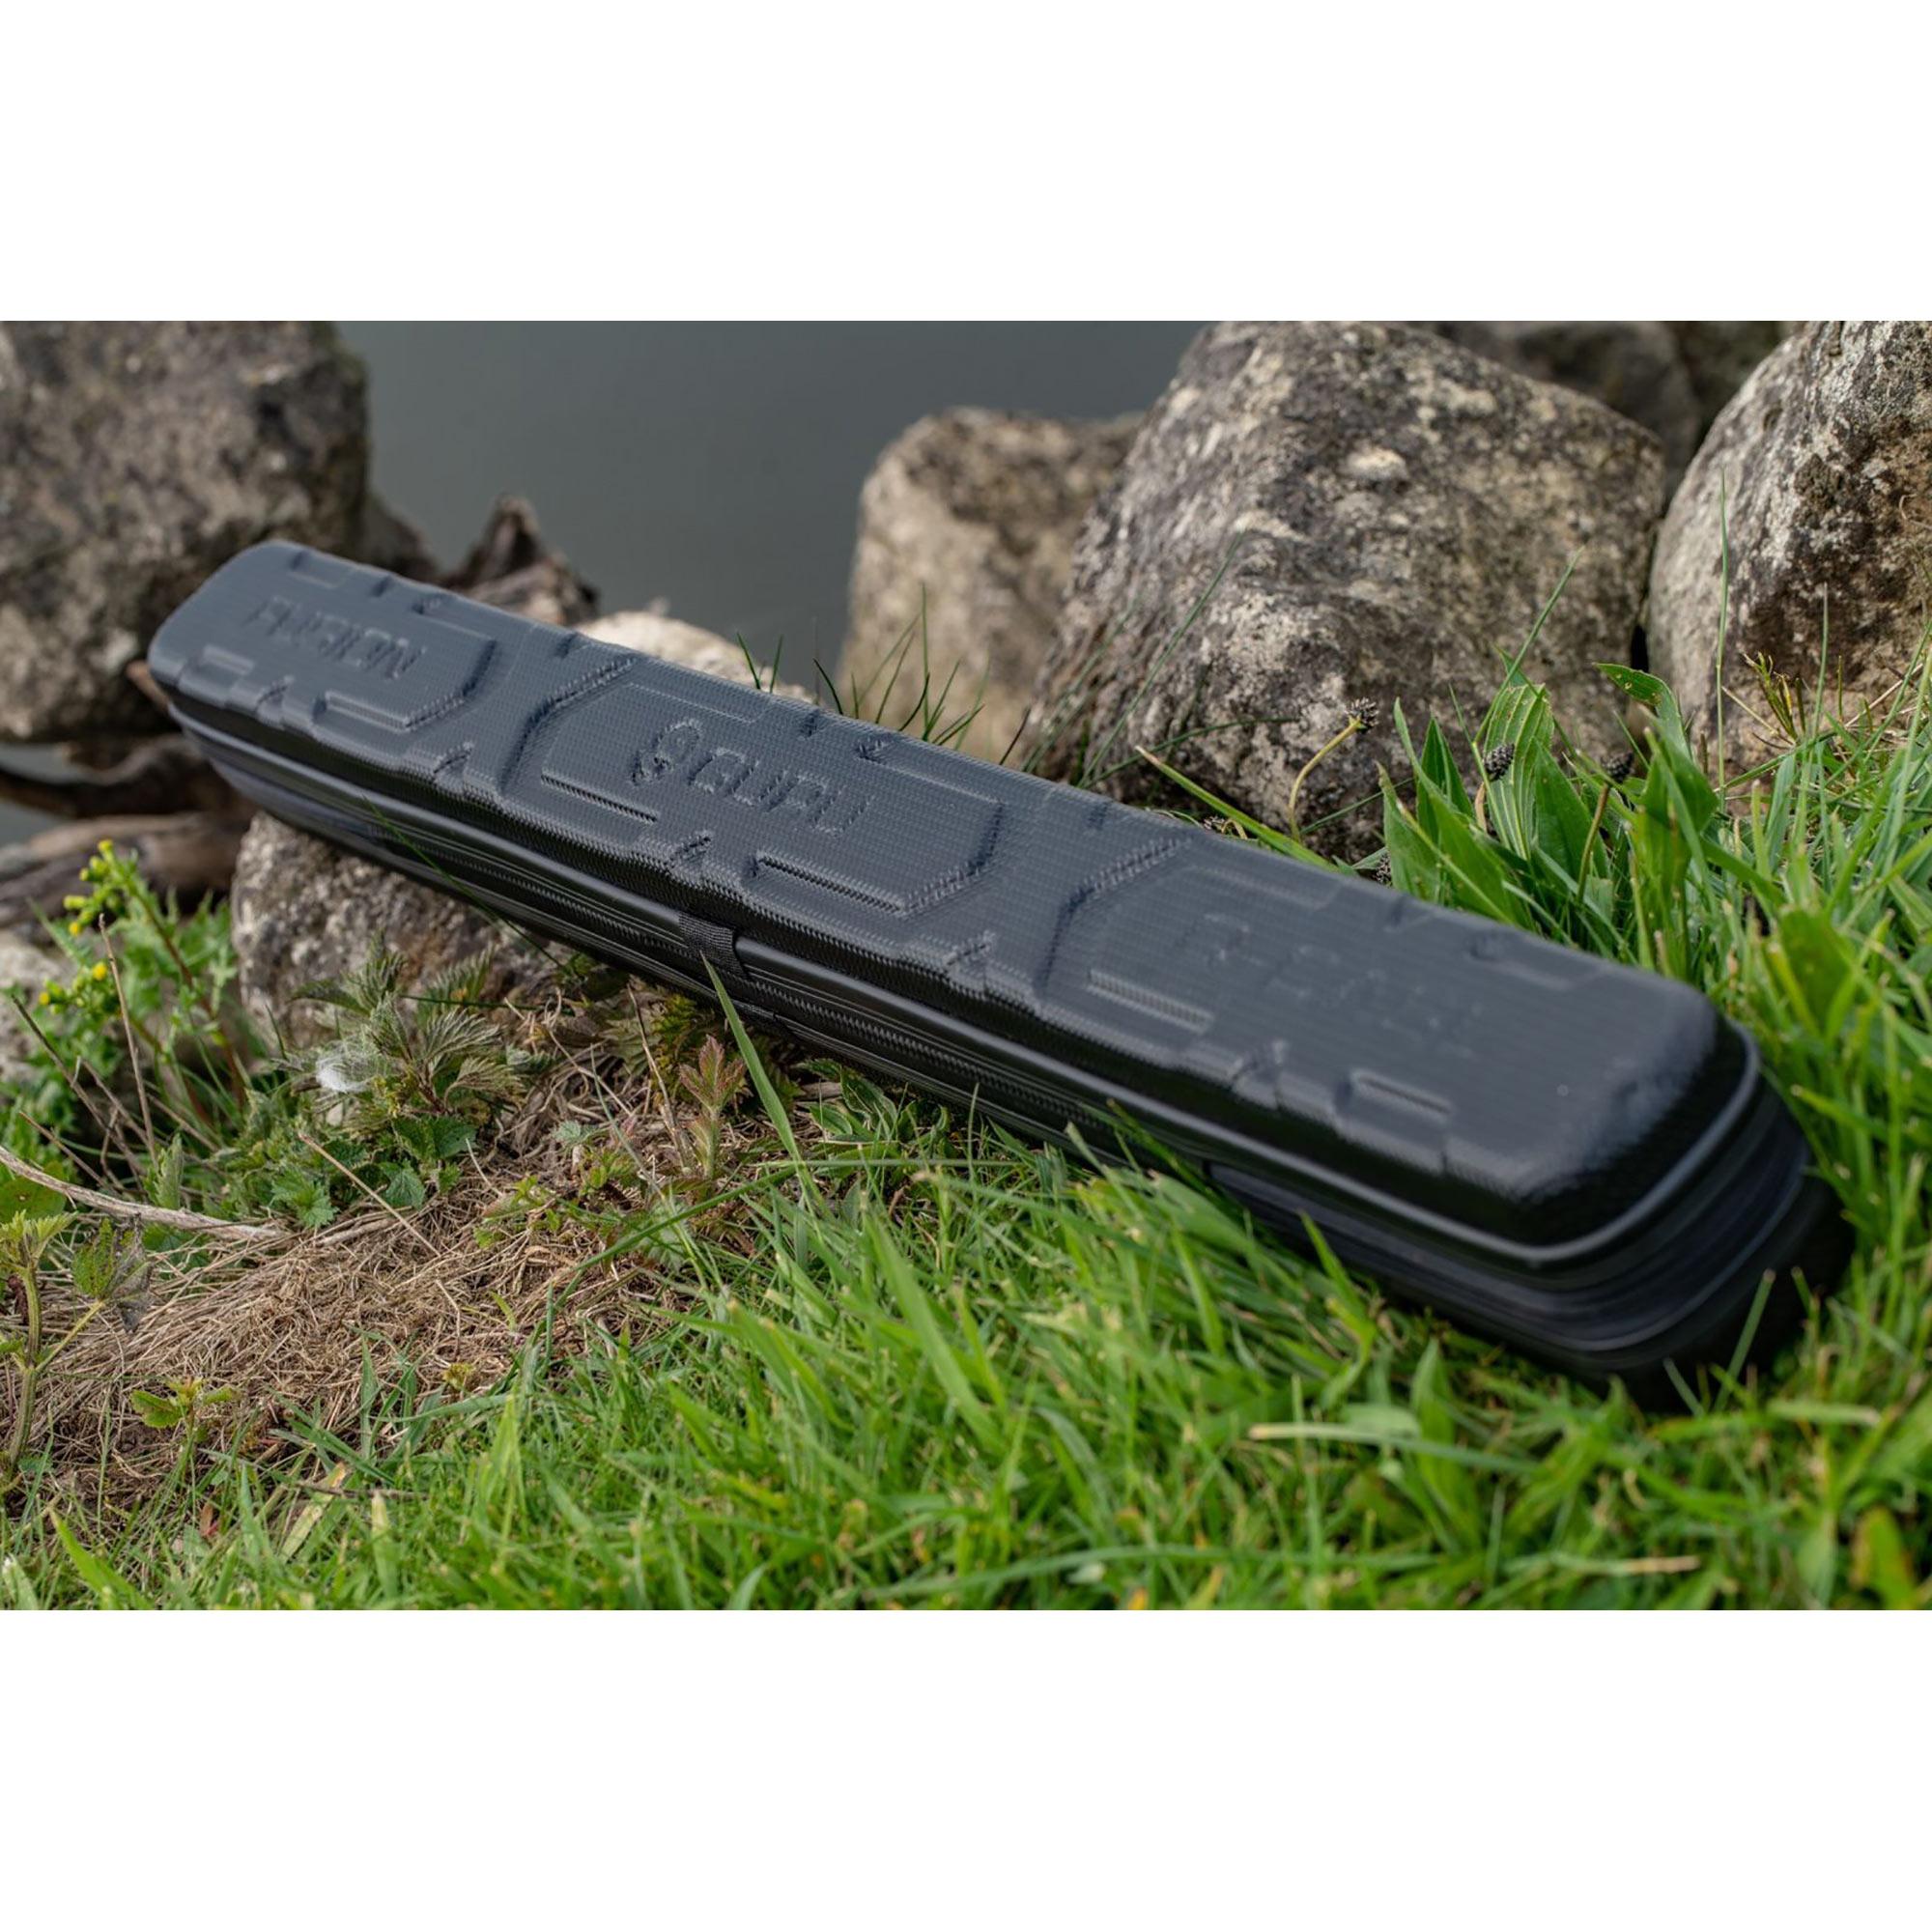 Fodero Rigido Porta cimini Q-Case GURU